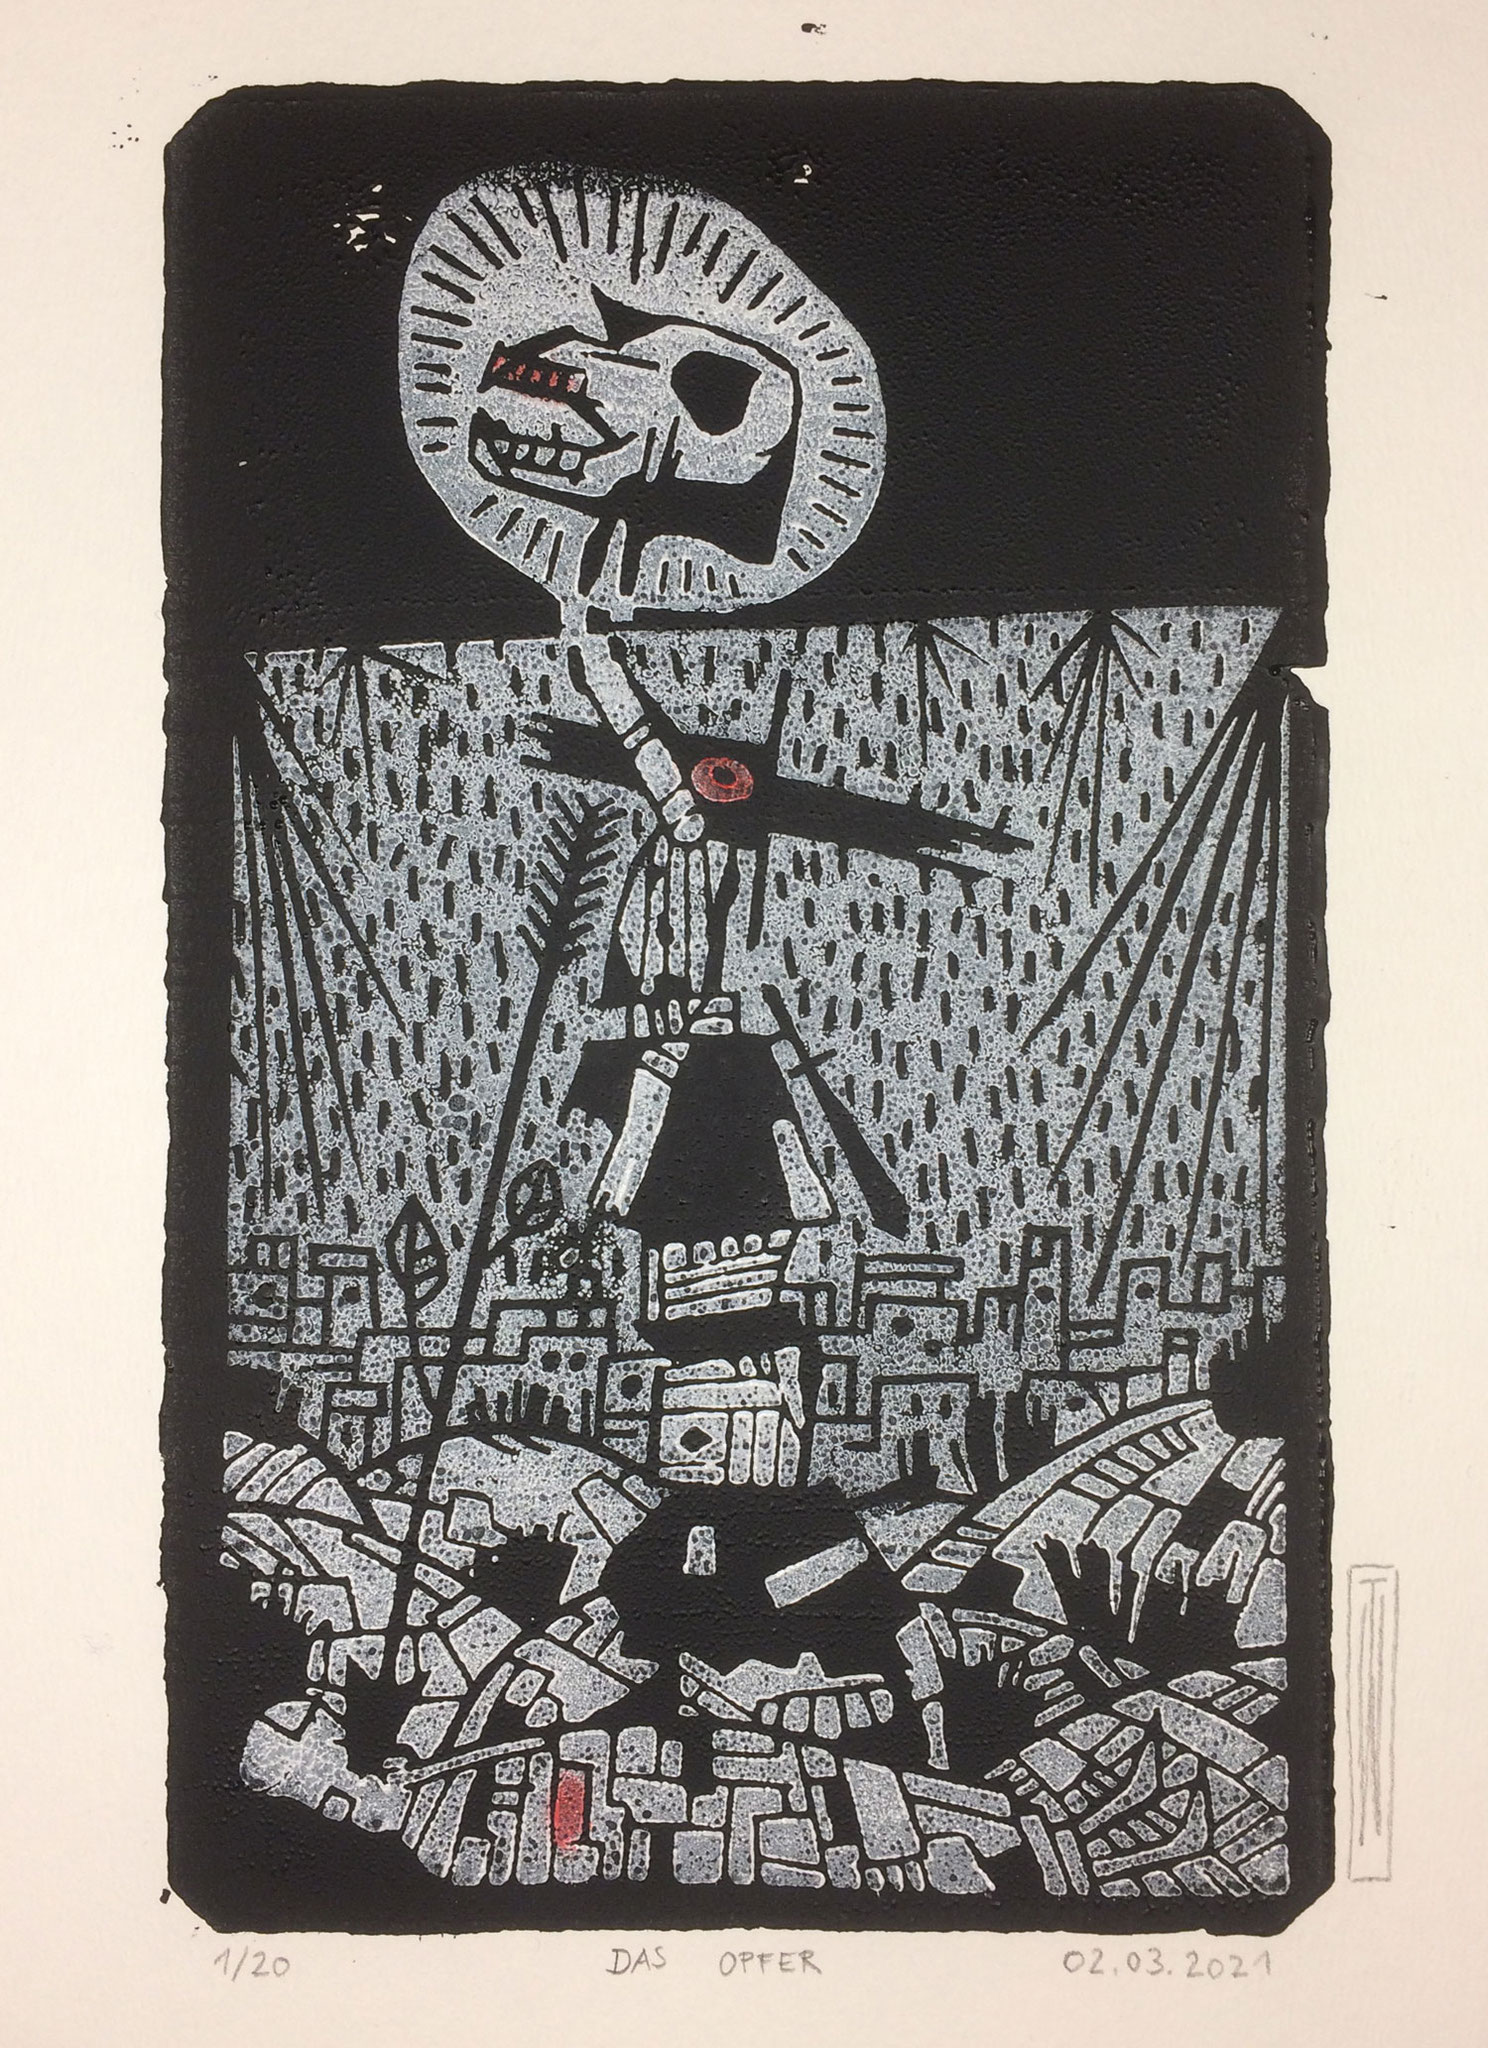 Opfer, Linoldruck, 13 x 21 cm